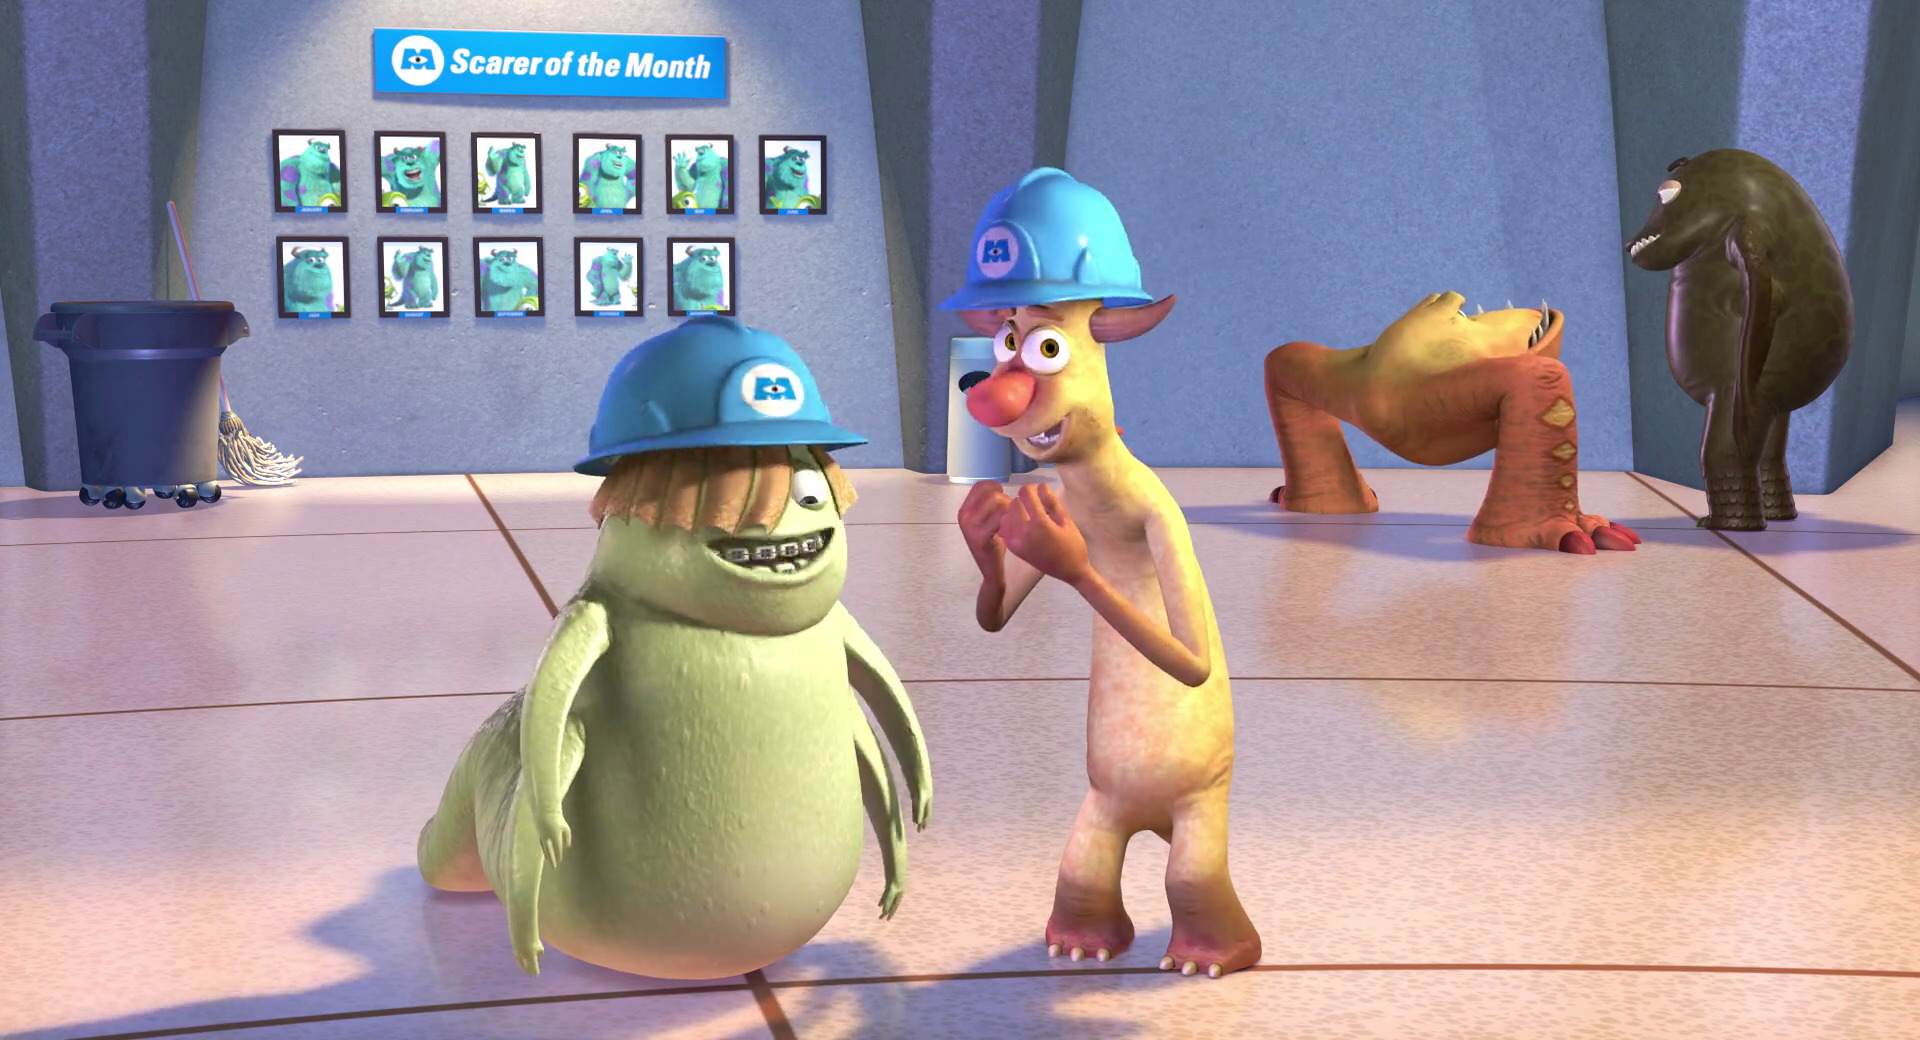 Needleman Smitty ferdinand alberique pixar disney personnage character monstres cie monsters inc